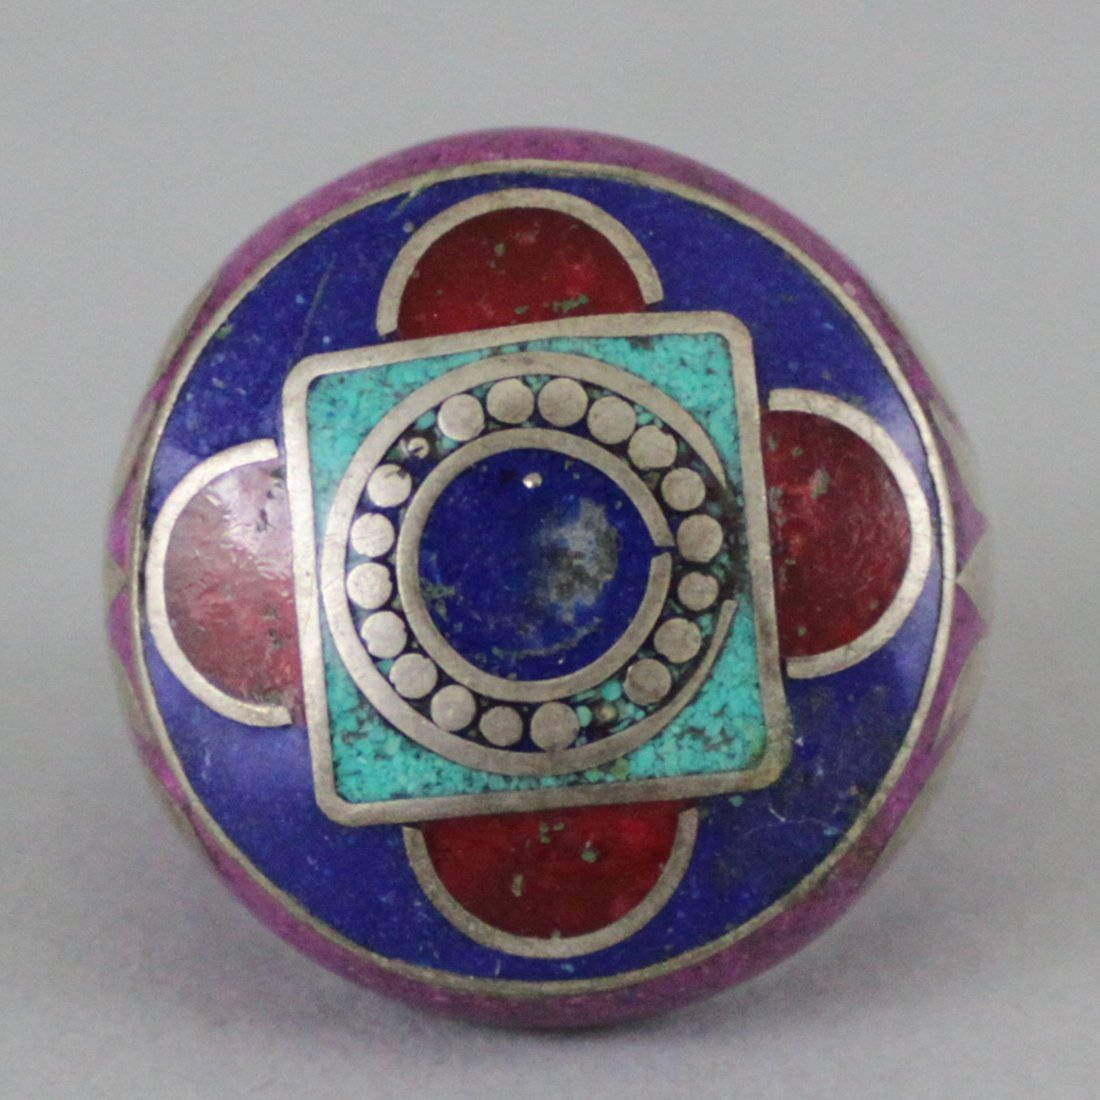 Nepal Tibet Silver Ring Inlaid Turquoise Lapis & Coral